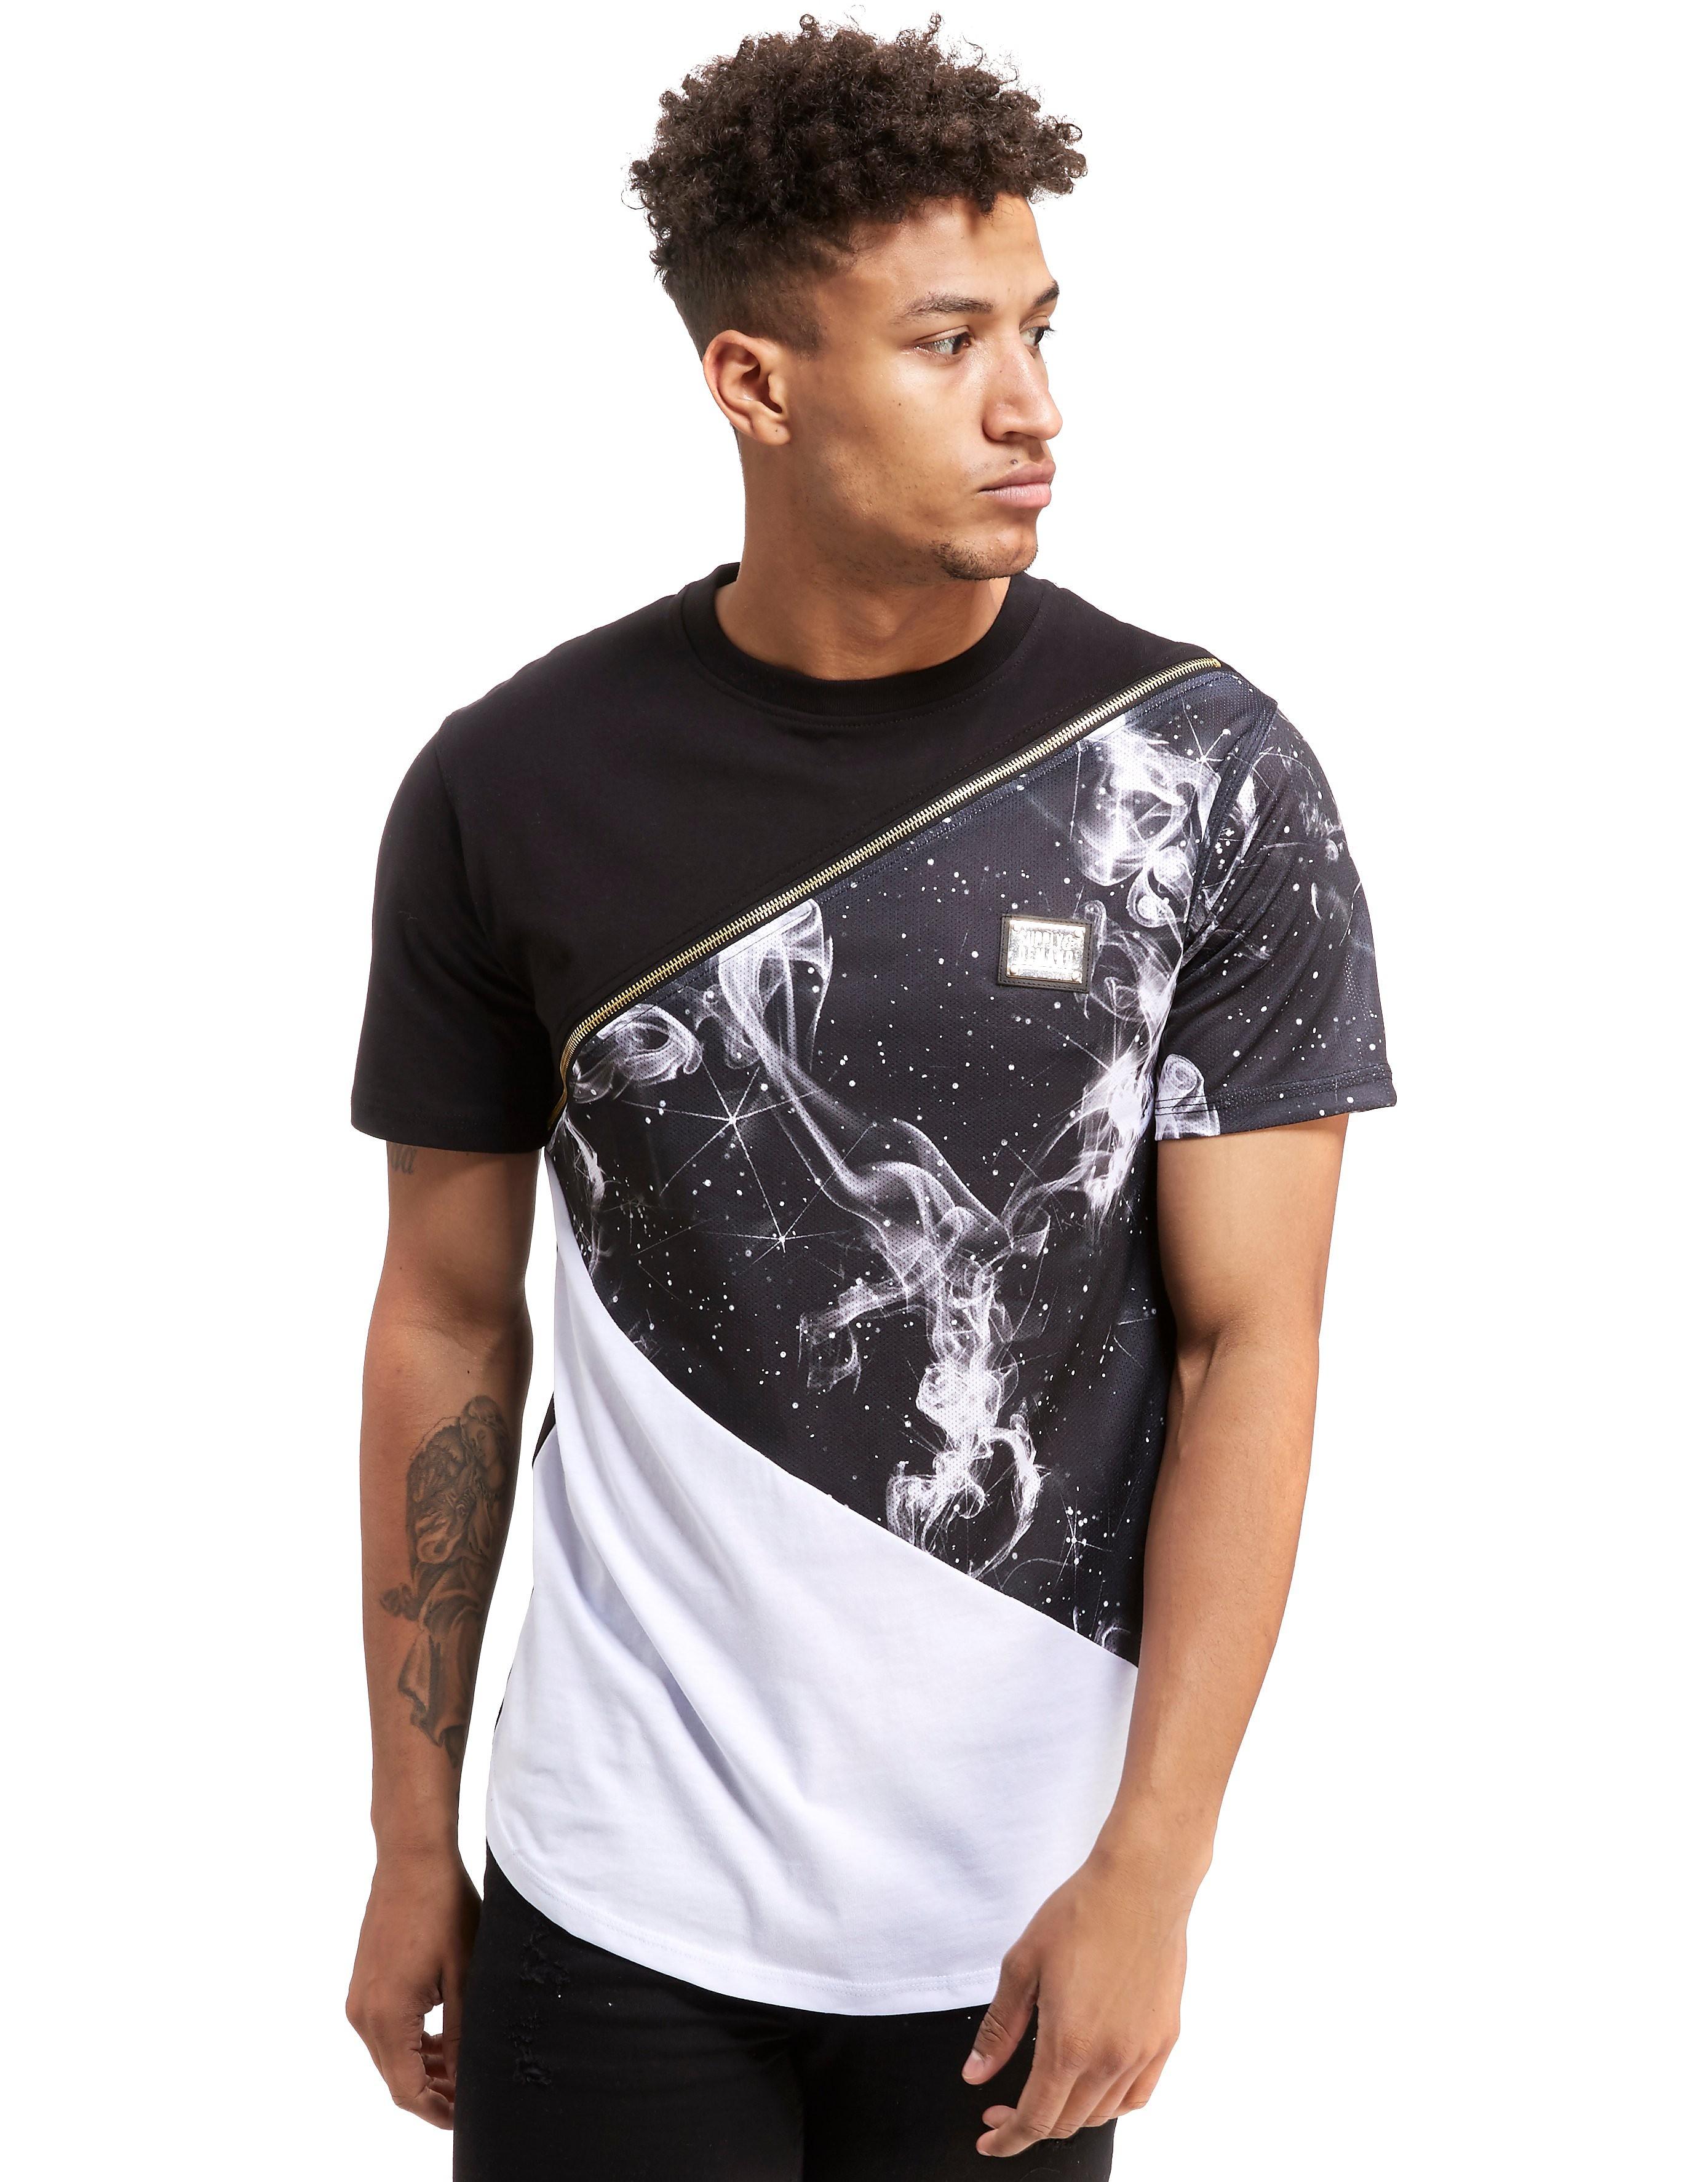 Supply & Demand General T-shirt